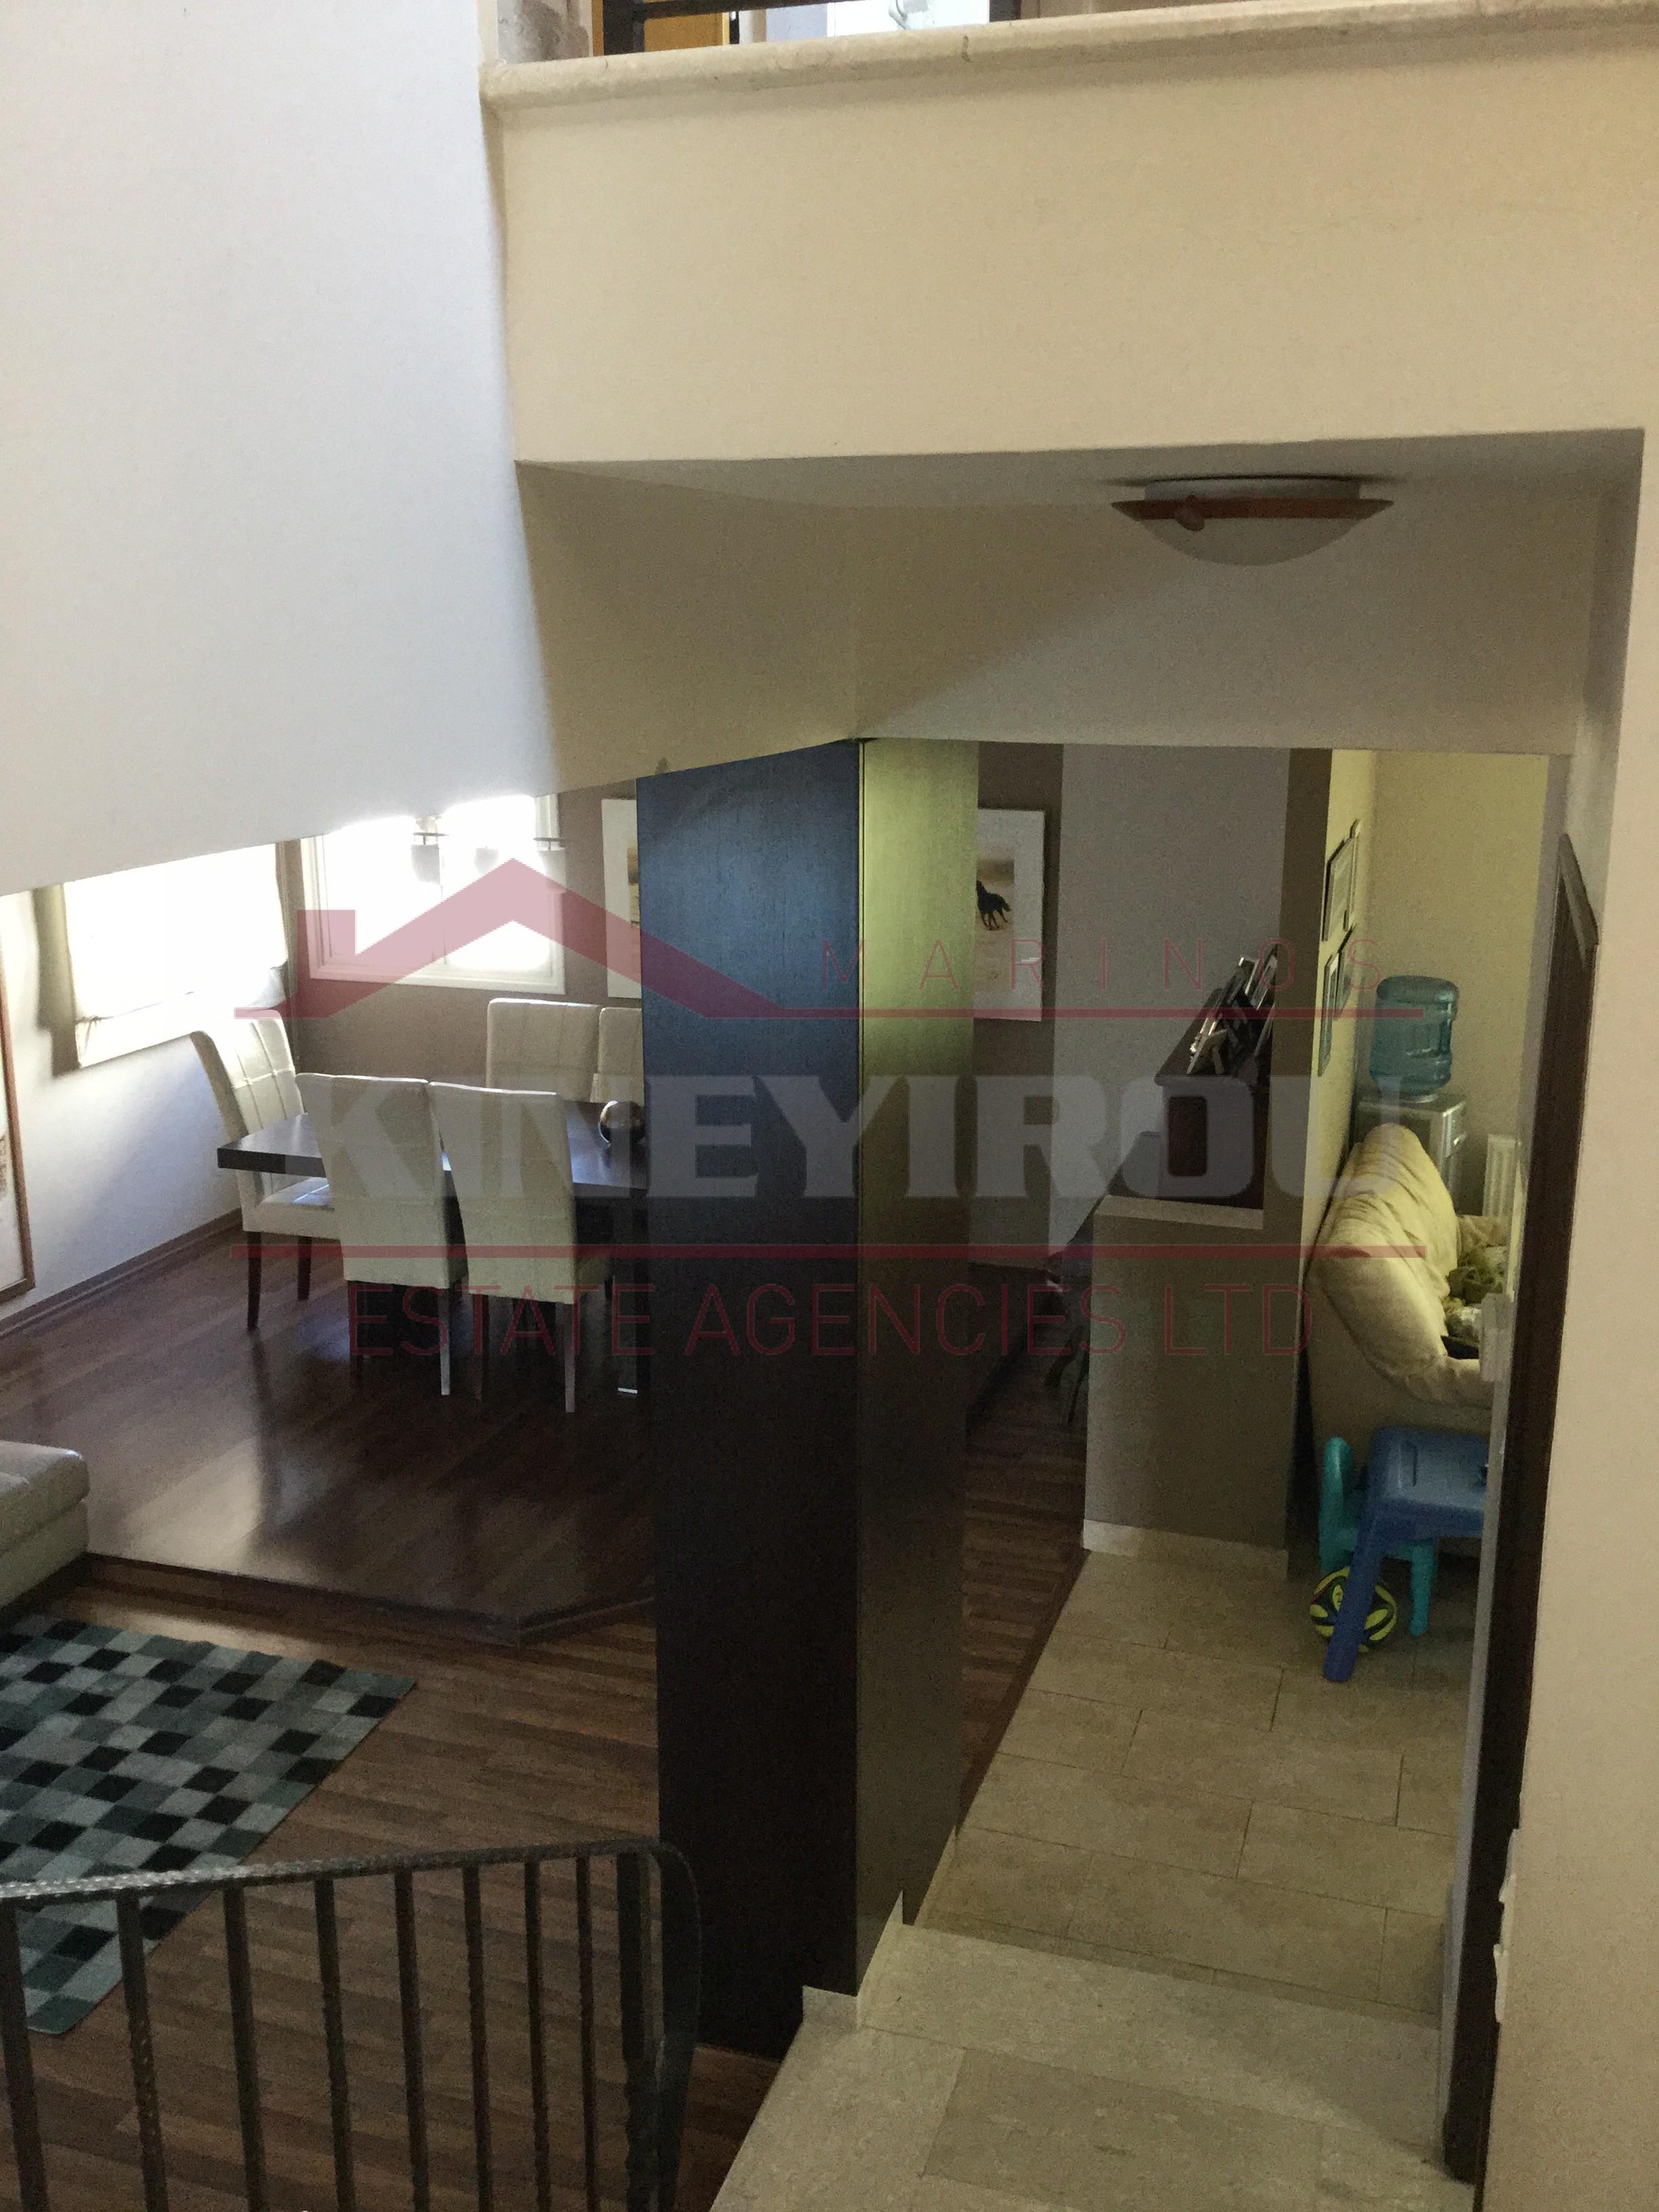 3 bedroom house for sale near G.C.Z – Stadium , Larnaca